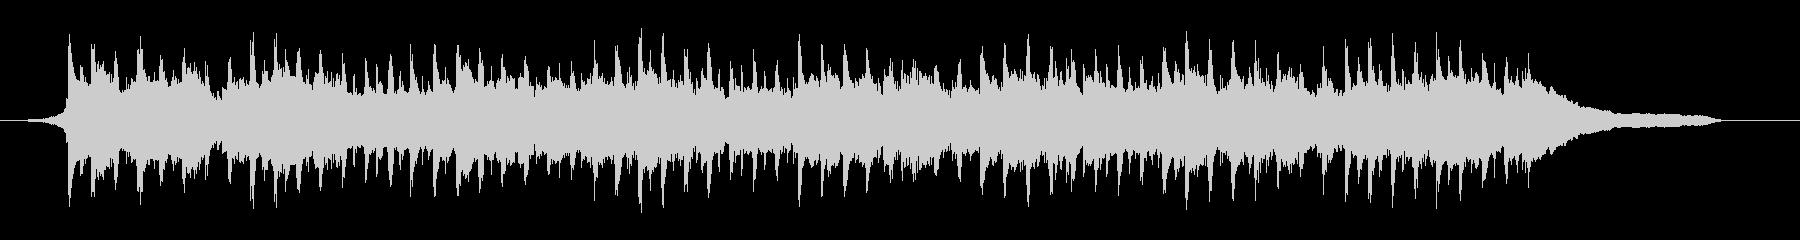 CM15/アコギ/爽やか/穏やか/感動的の未再生の波形